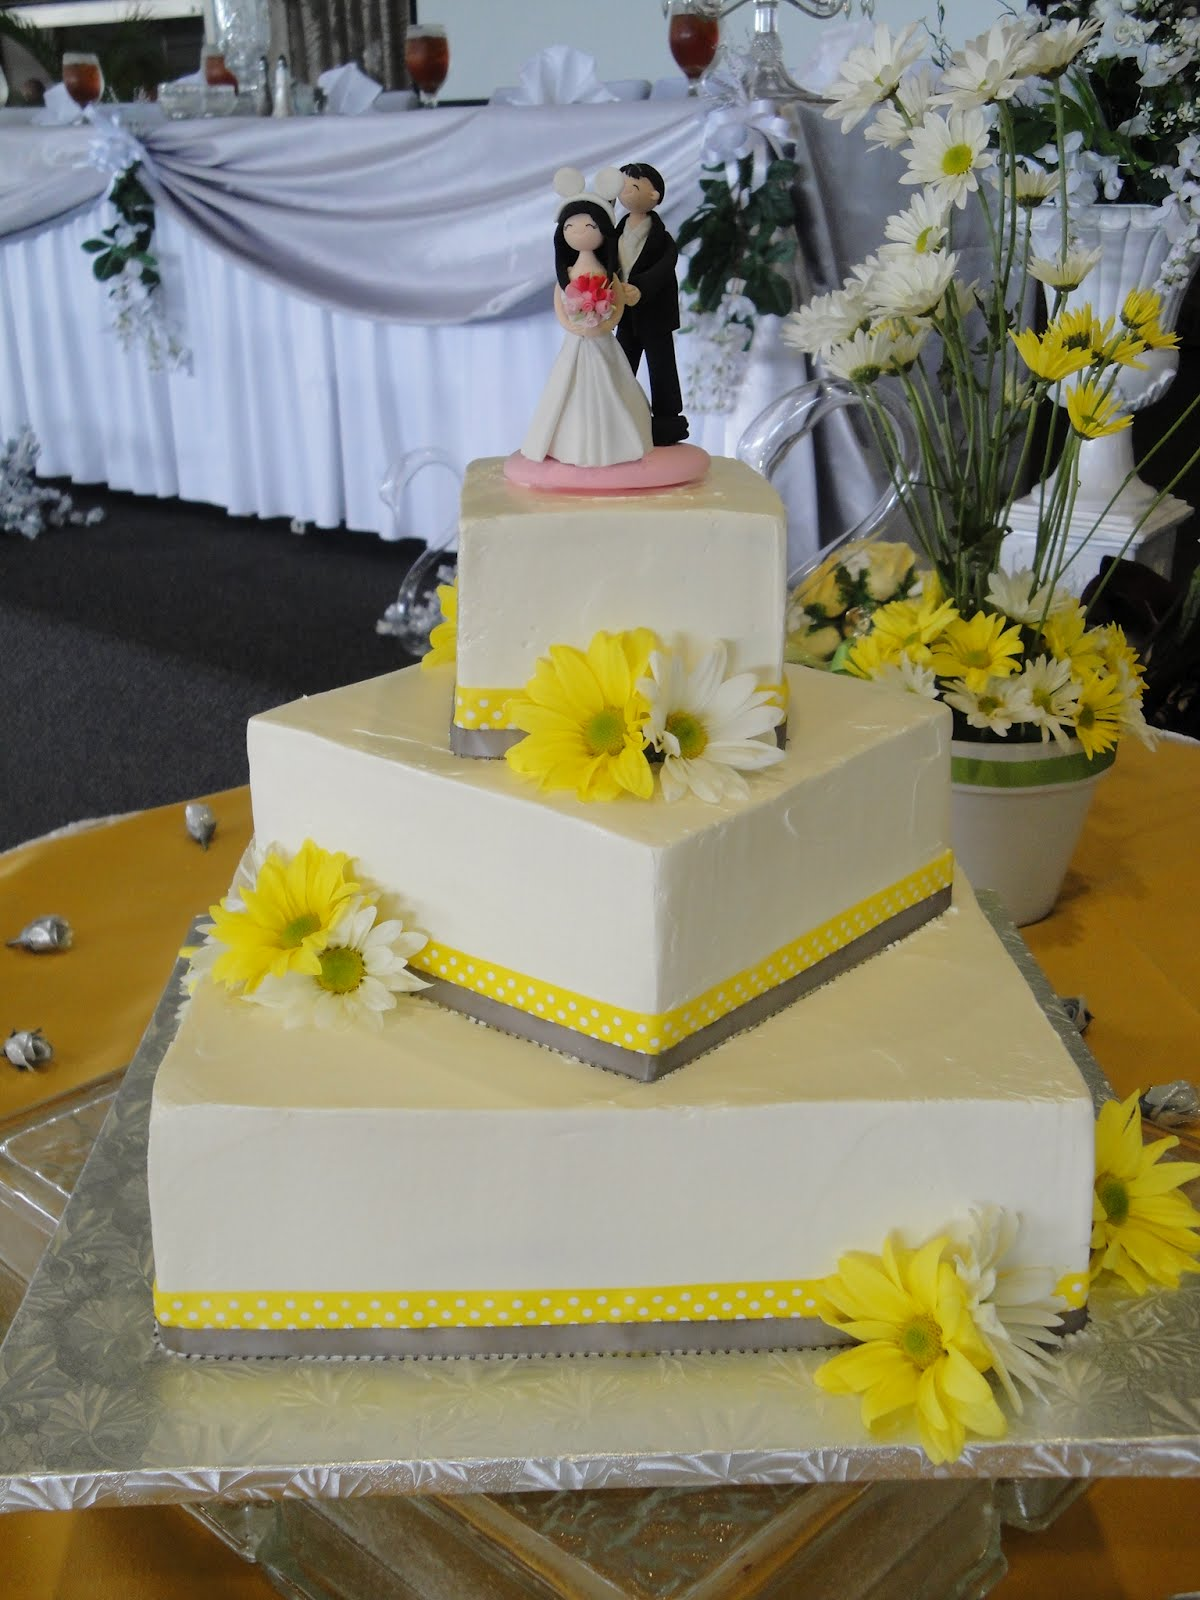 Desserts by Tiffanie 2011 Square Wedding Cakes